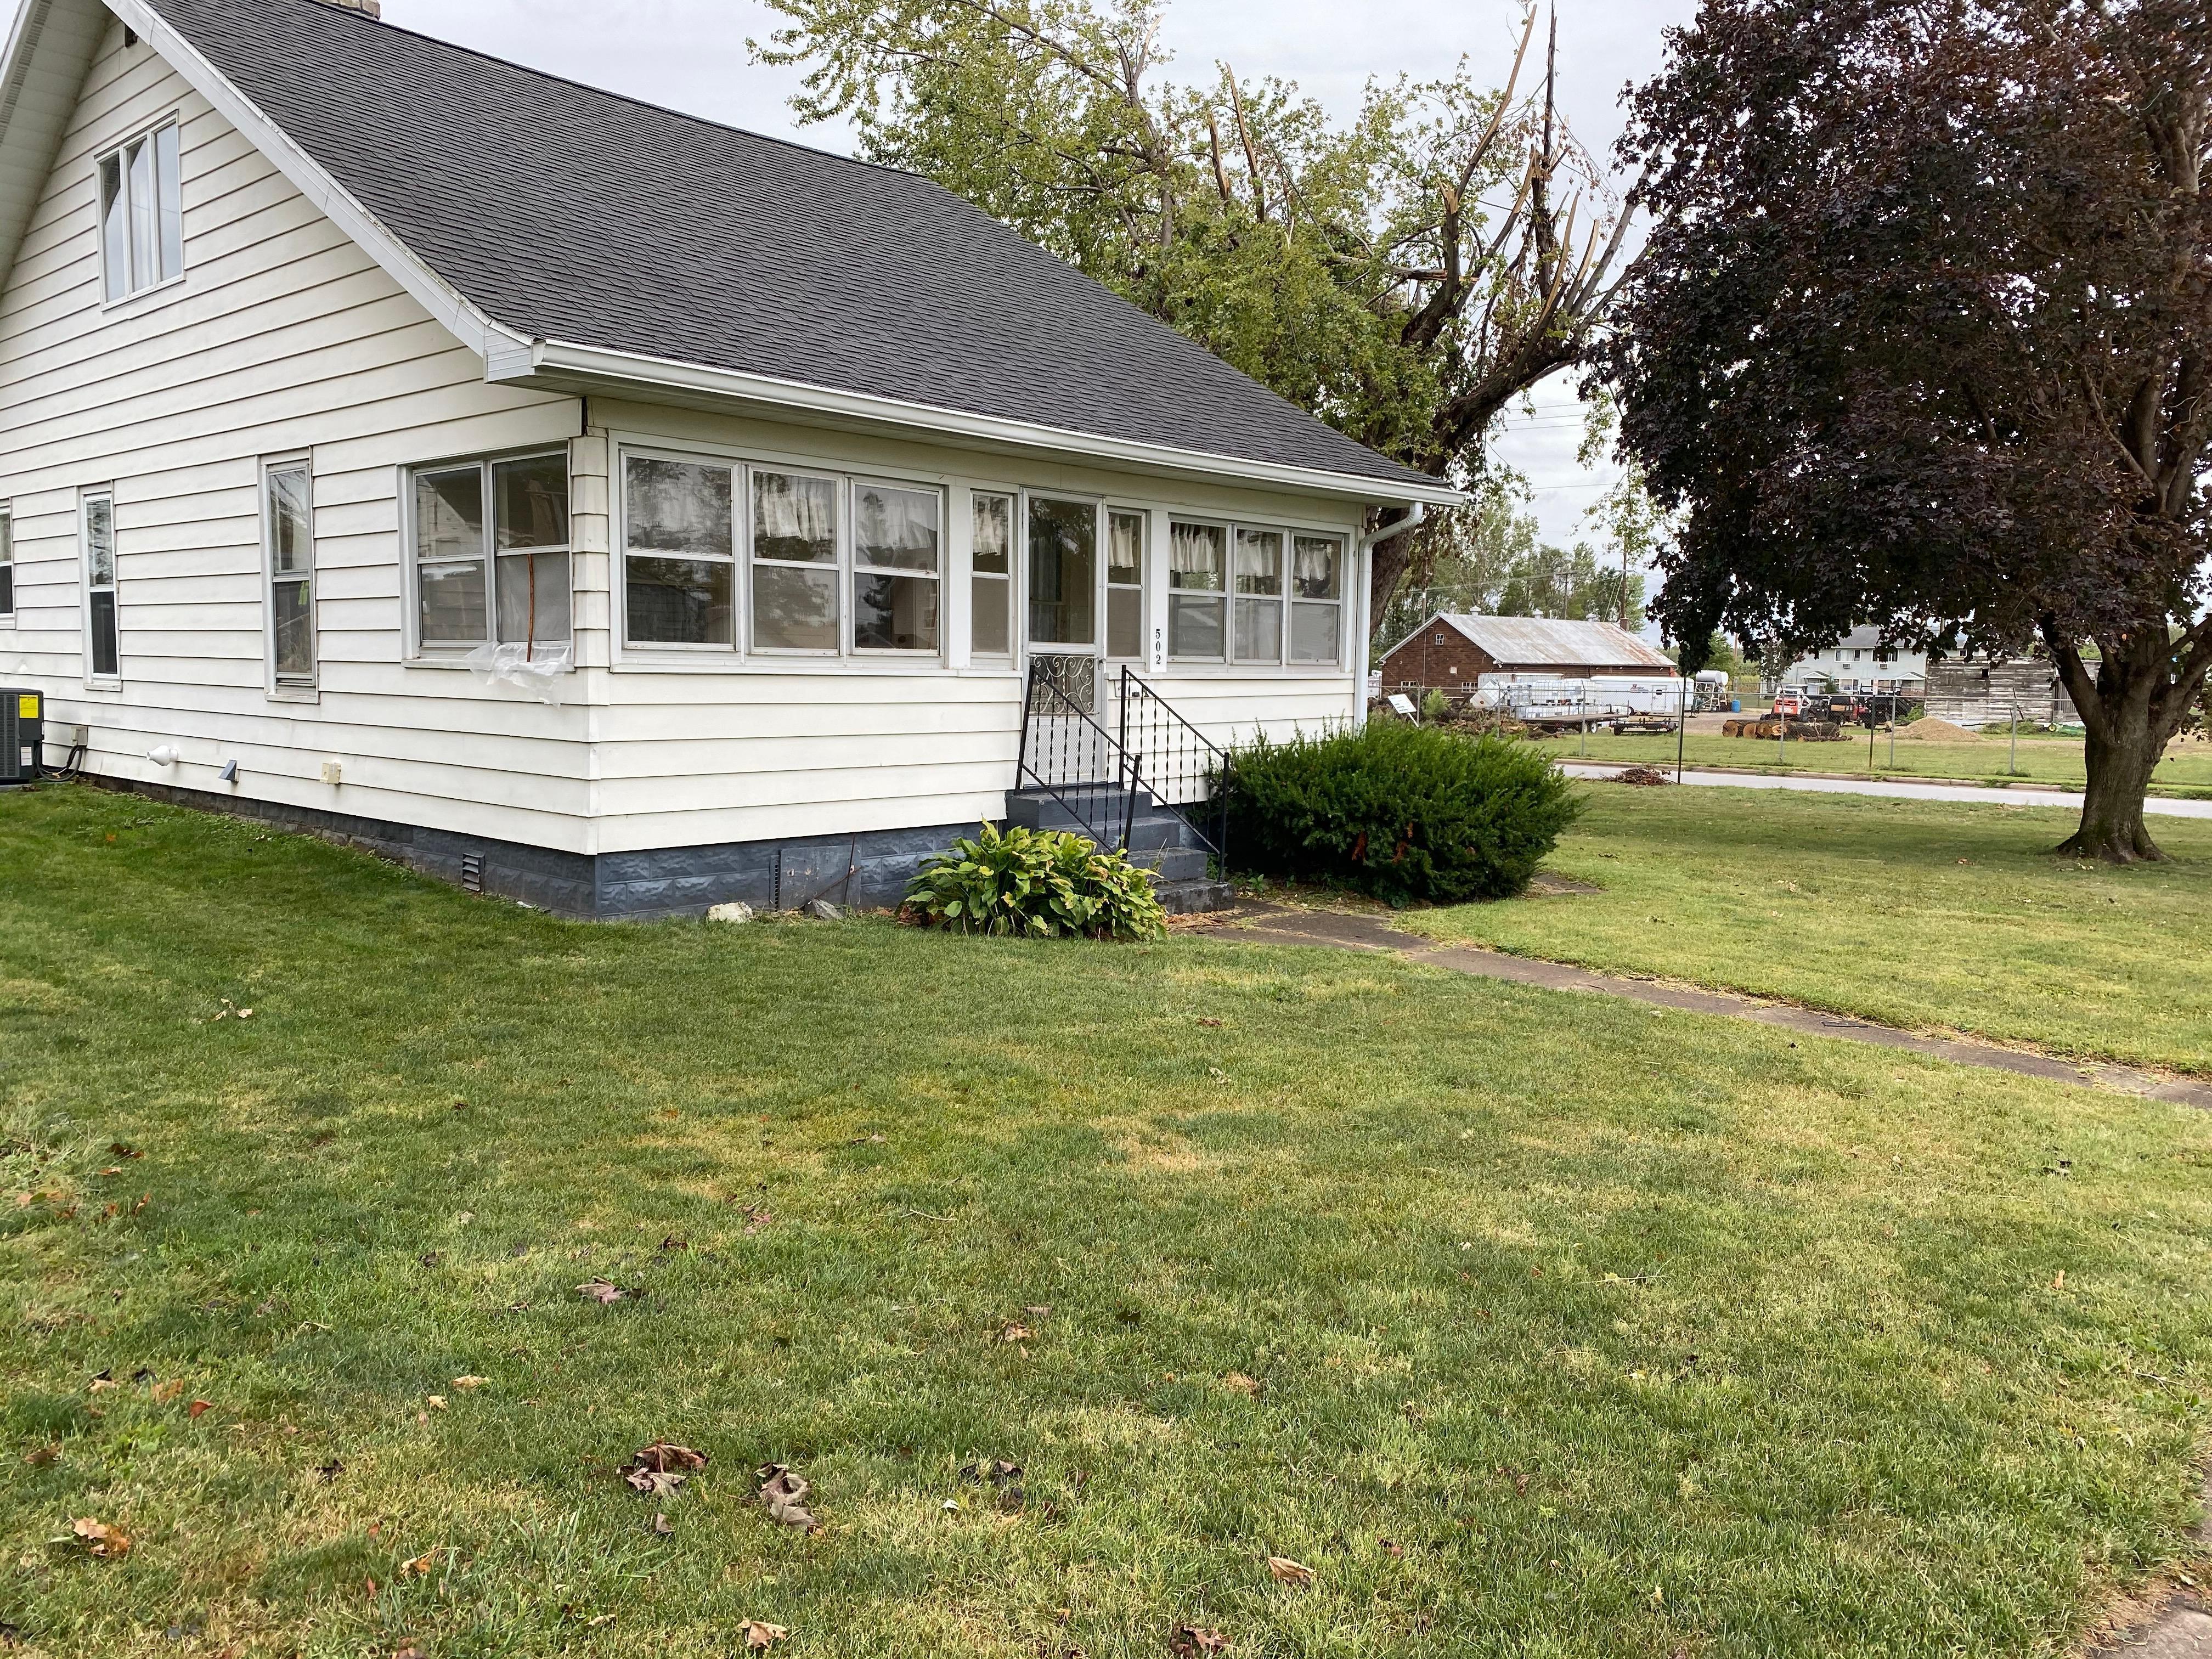 502 Garfield, Tama, Iowa 52339-2314, 3 Bedrooms Bedrooms, ,1 BathroomBathrooms,Single Family,For Sale,Garfield,5654520